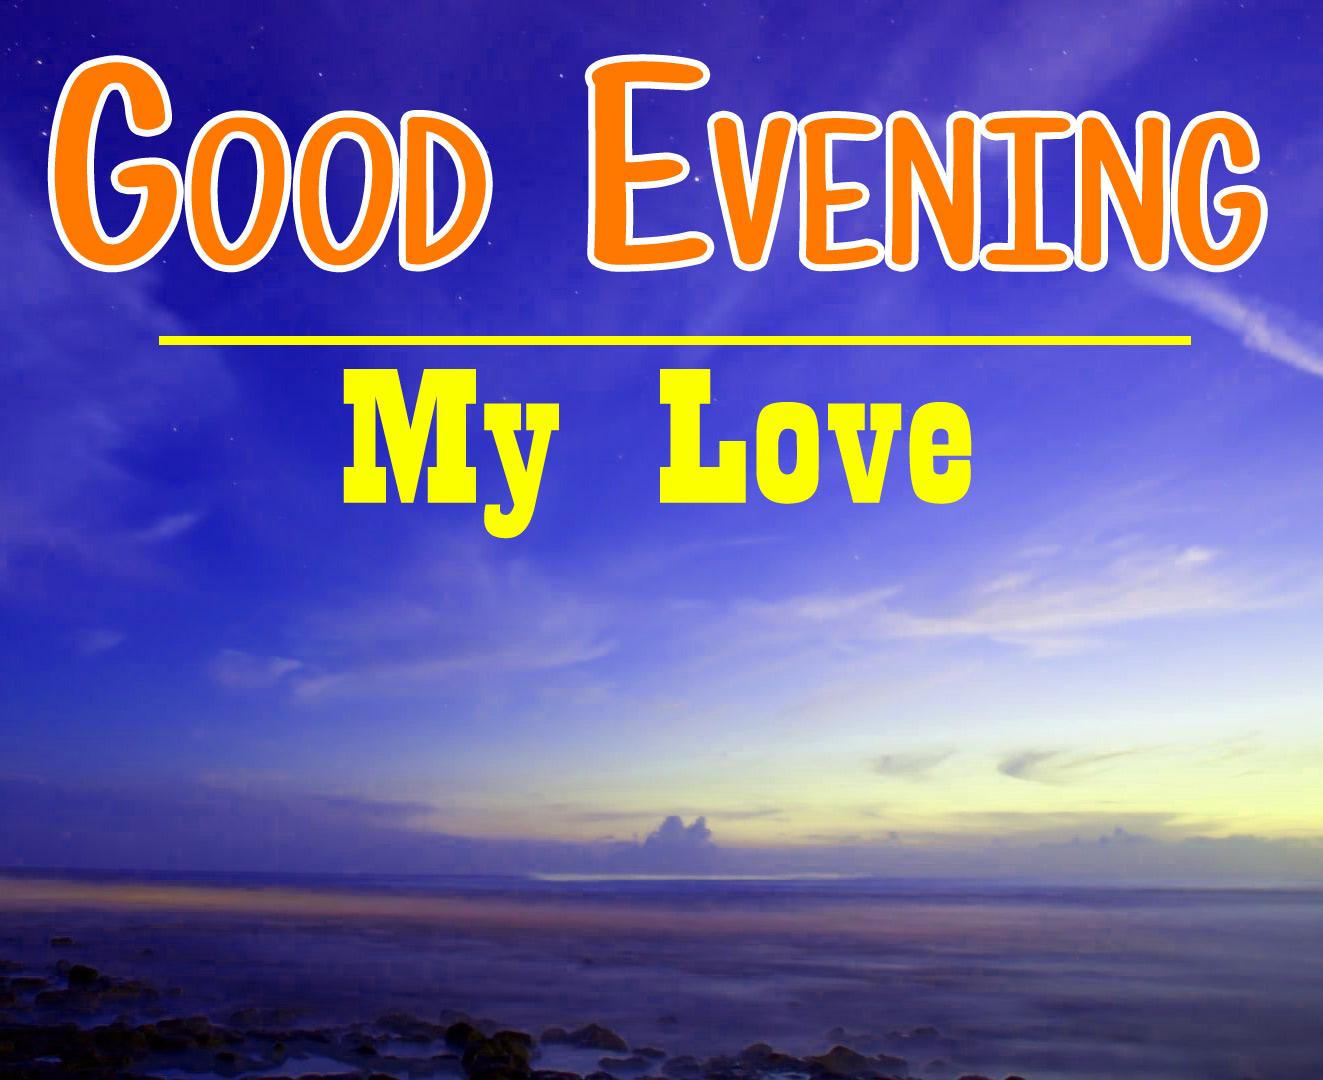 good evening photo 2